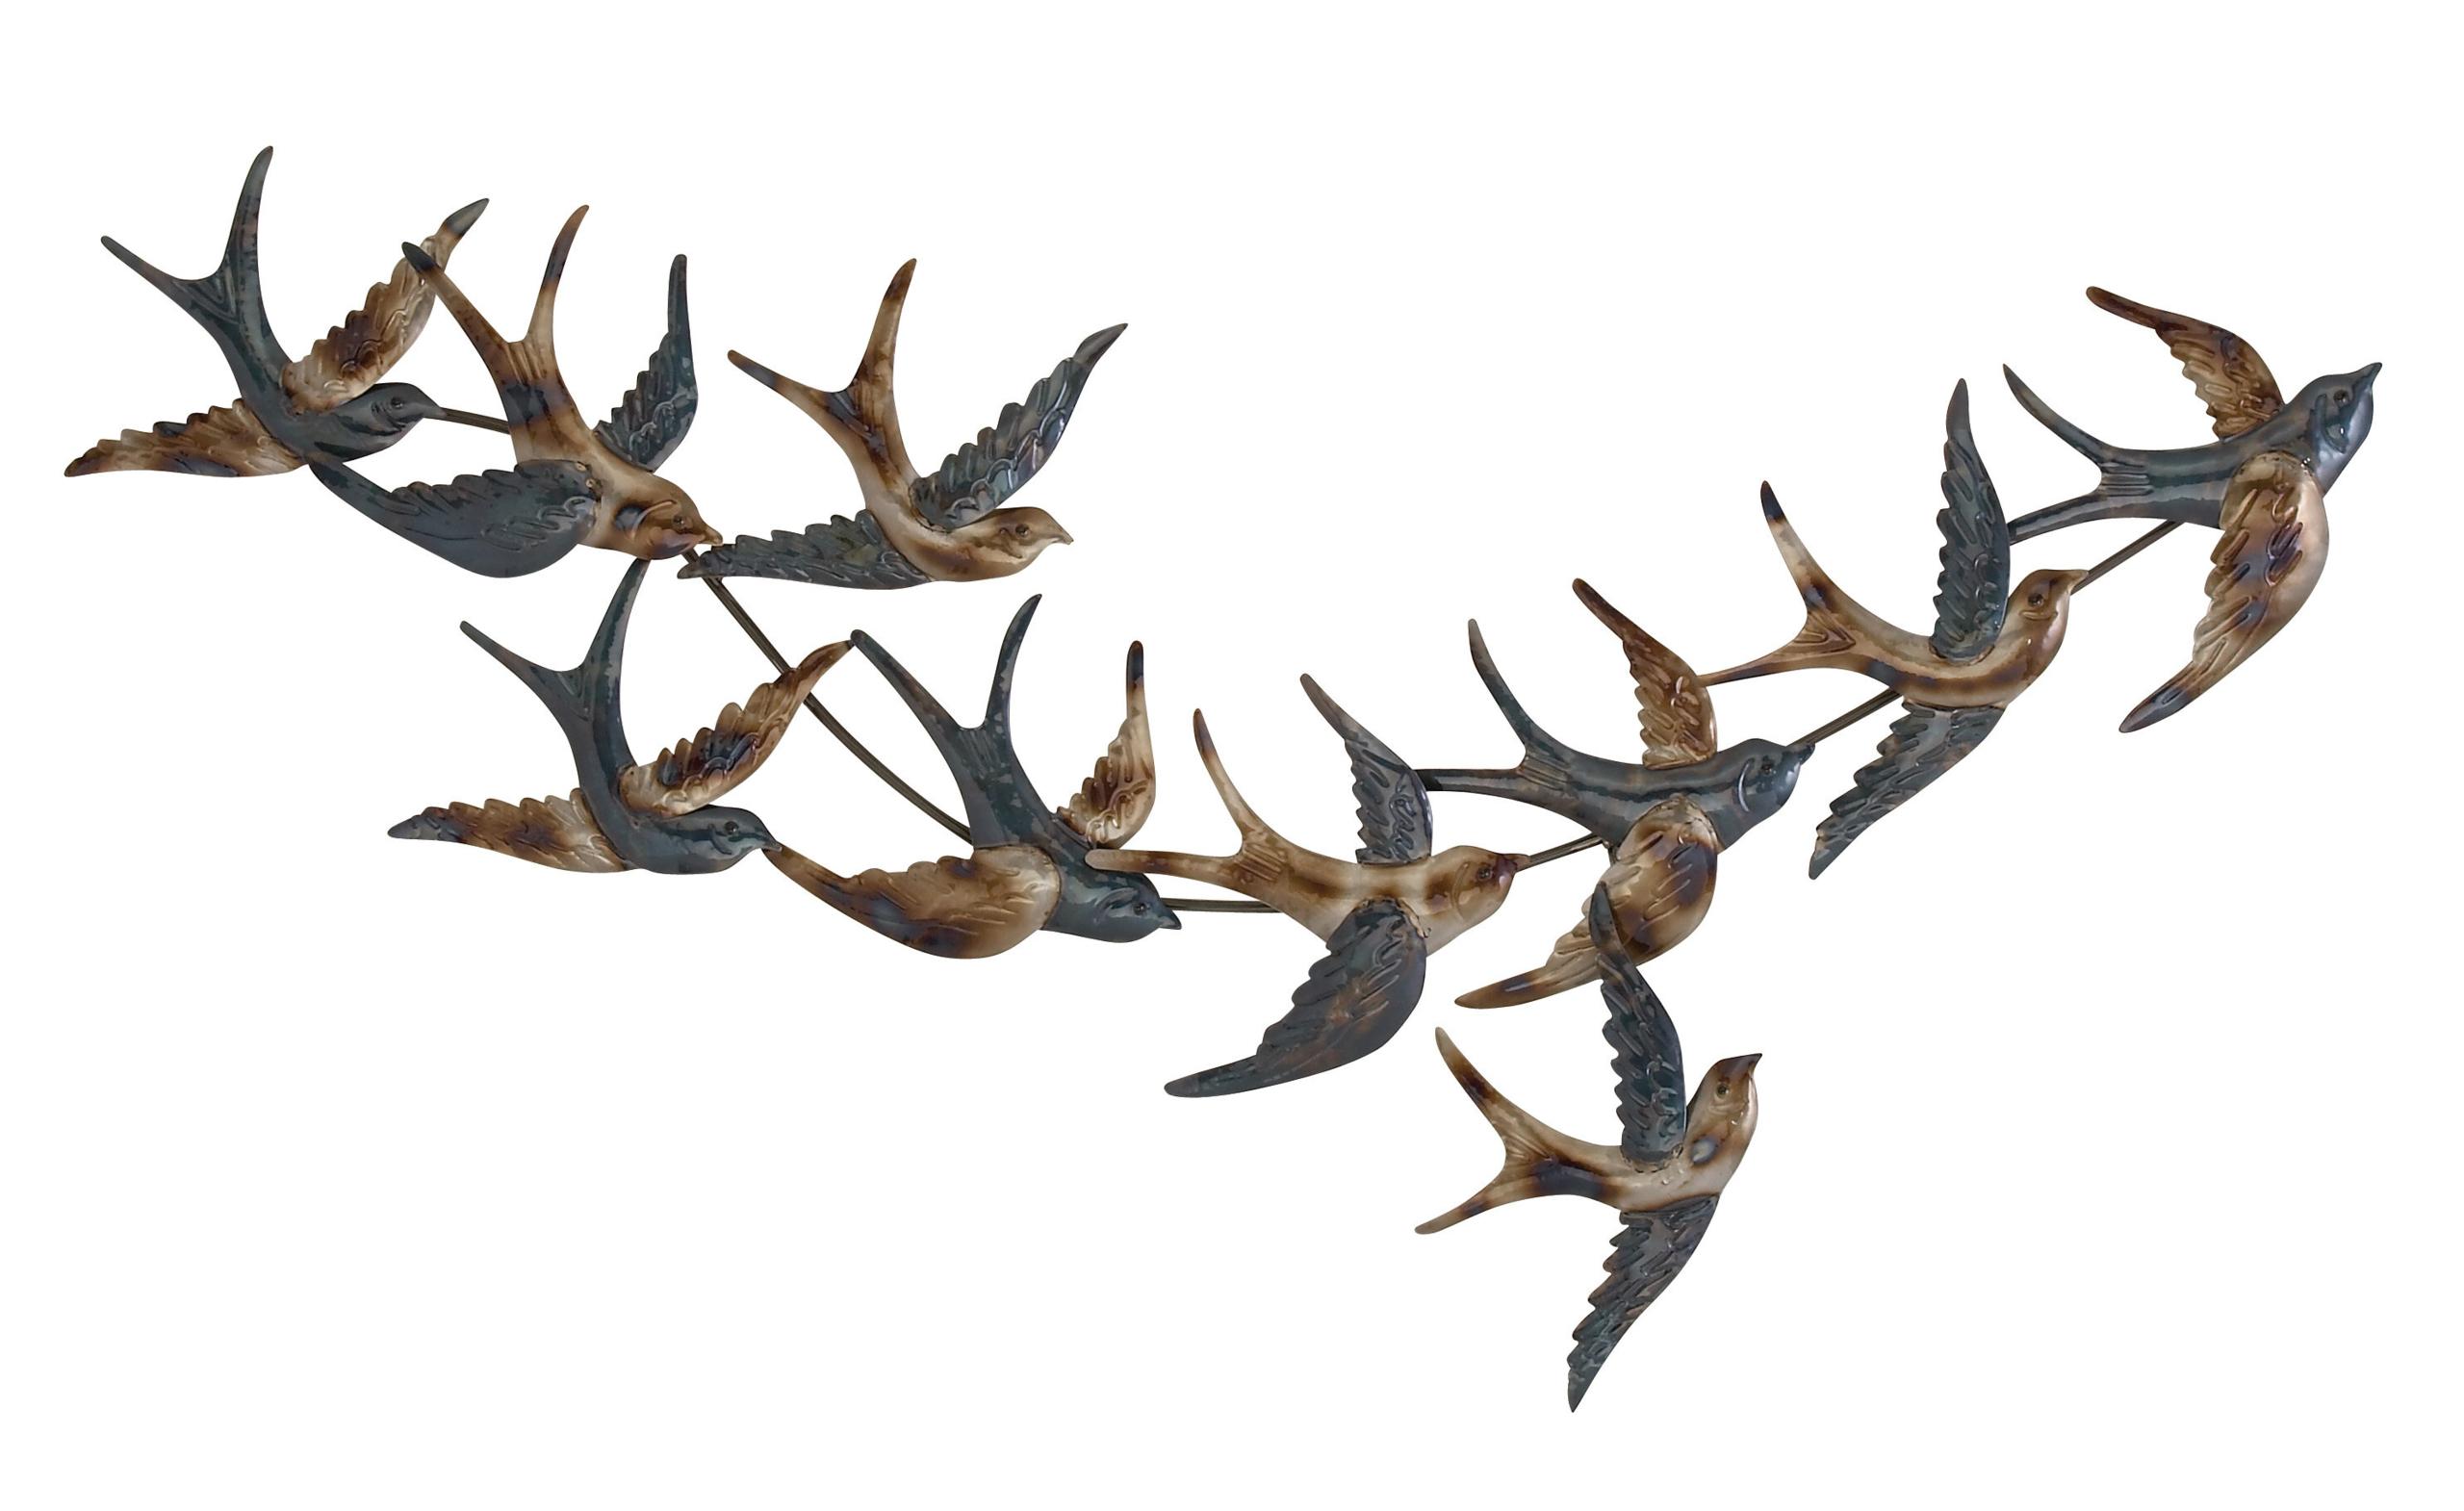 Metal Bird Wall Decor You'll Love in 2021 - VisualHunt